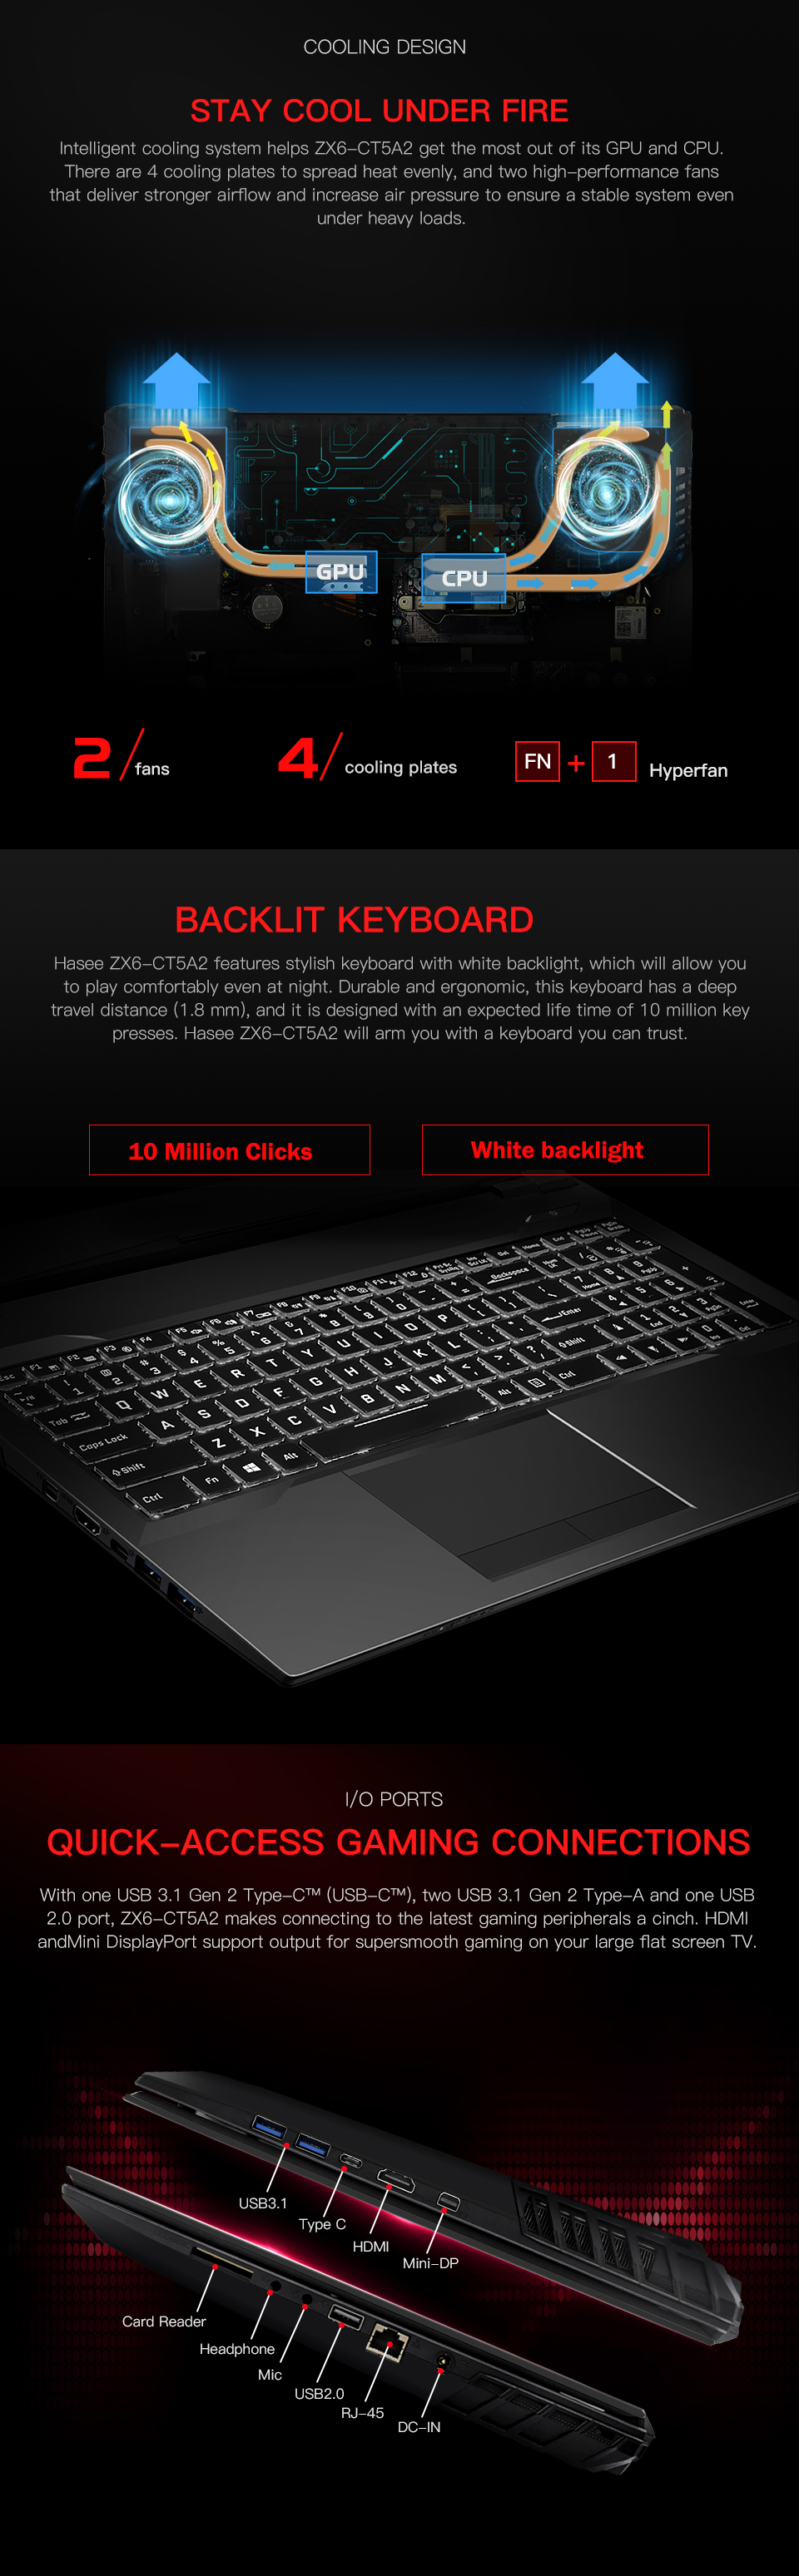 Ноутбук hasee ZX6-CT5A2 для игр(Intel Core I5-9400+ GTX 1050Ti/8GB ram/512G SSD/15,6 ''IPS 45% NTSC) настольный ноутбук hasee